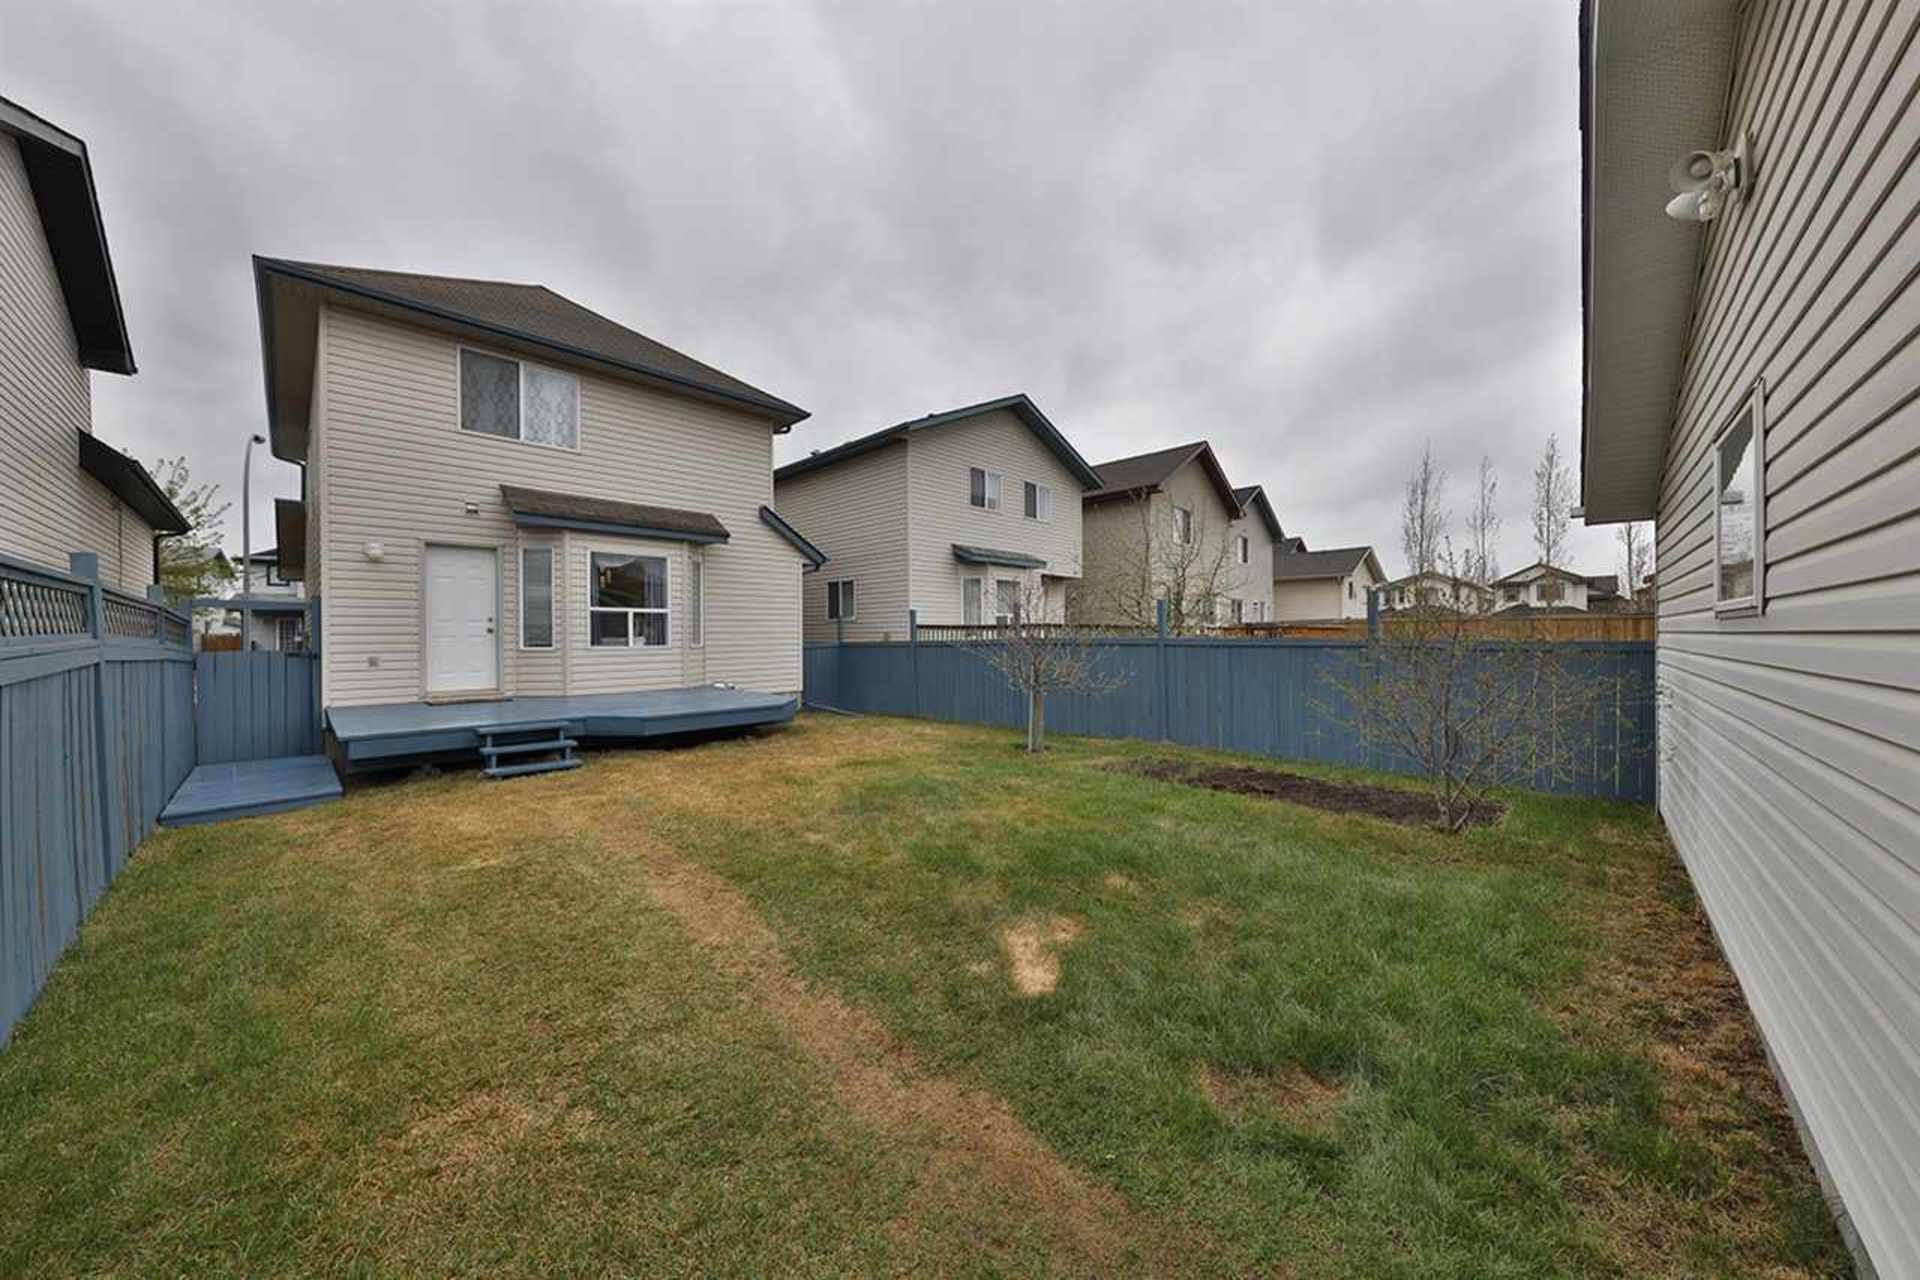 11630-167b-avenue-canossa-edmonton-17 at 11630 167b Avenue, Canossa, Edmonton